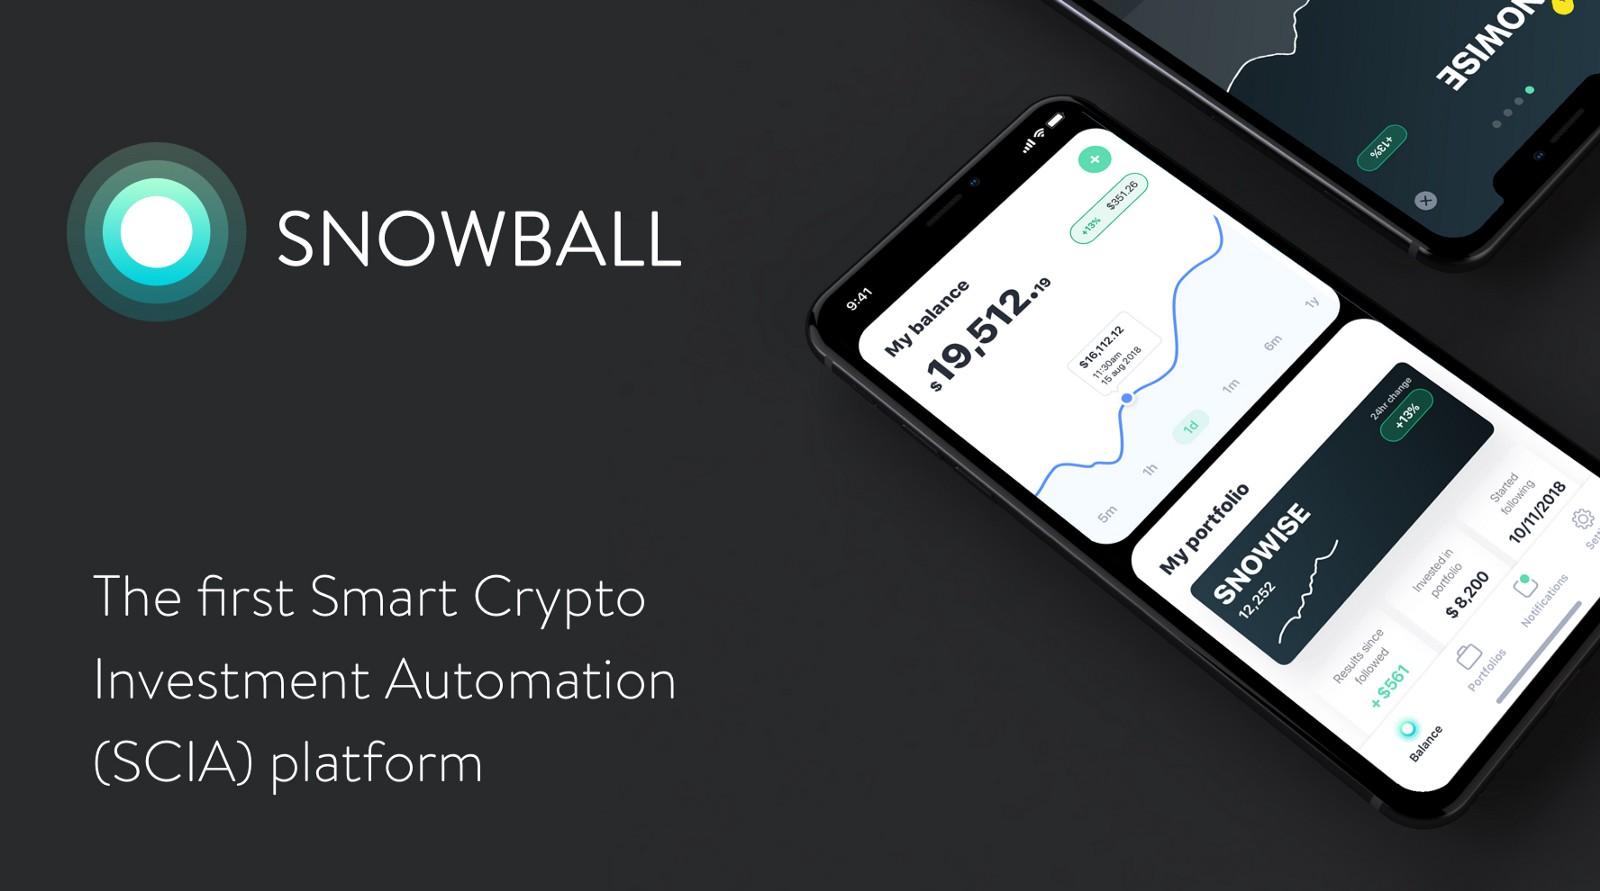 Snowball Offers